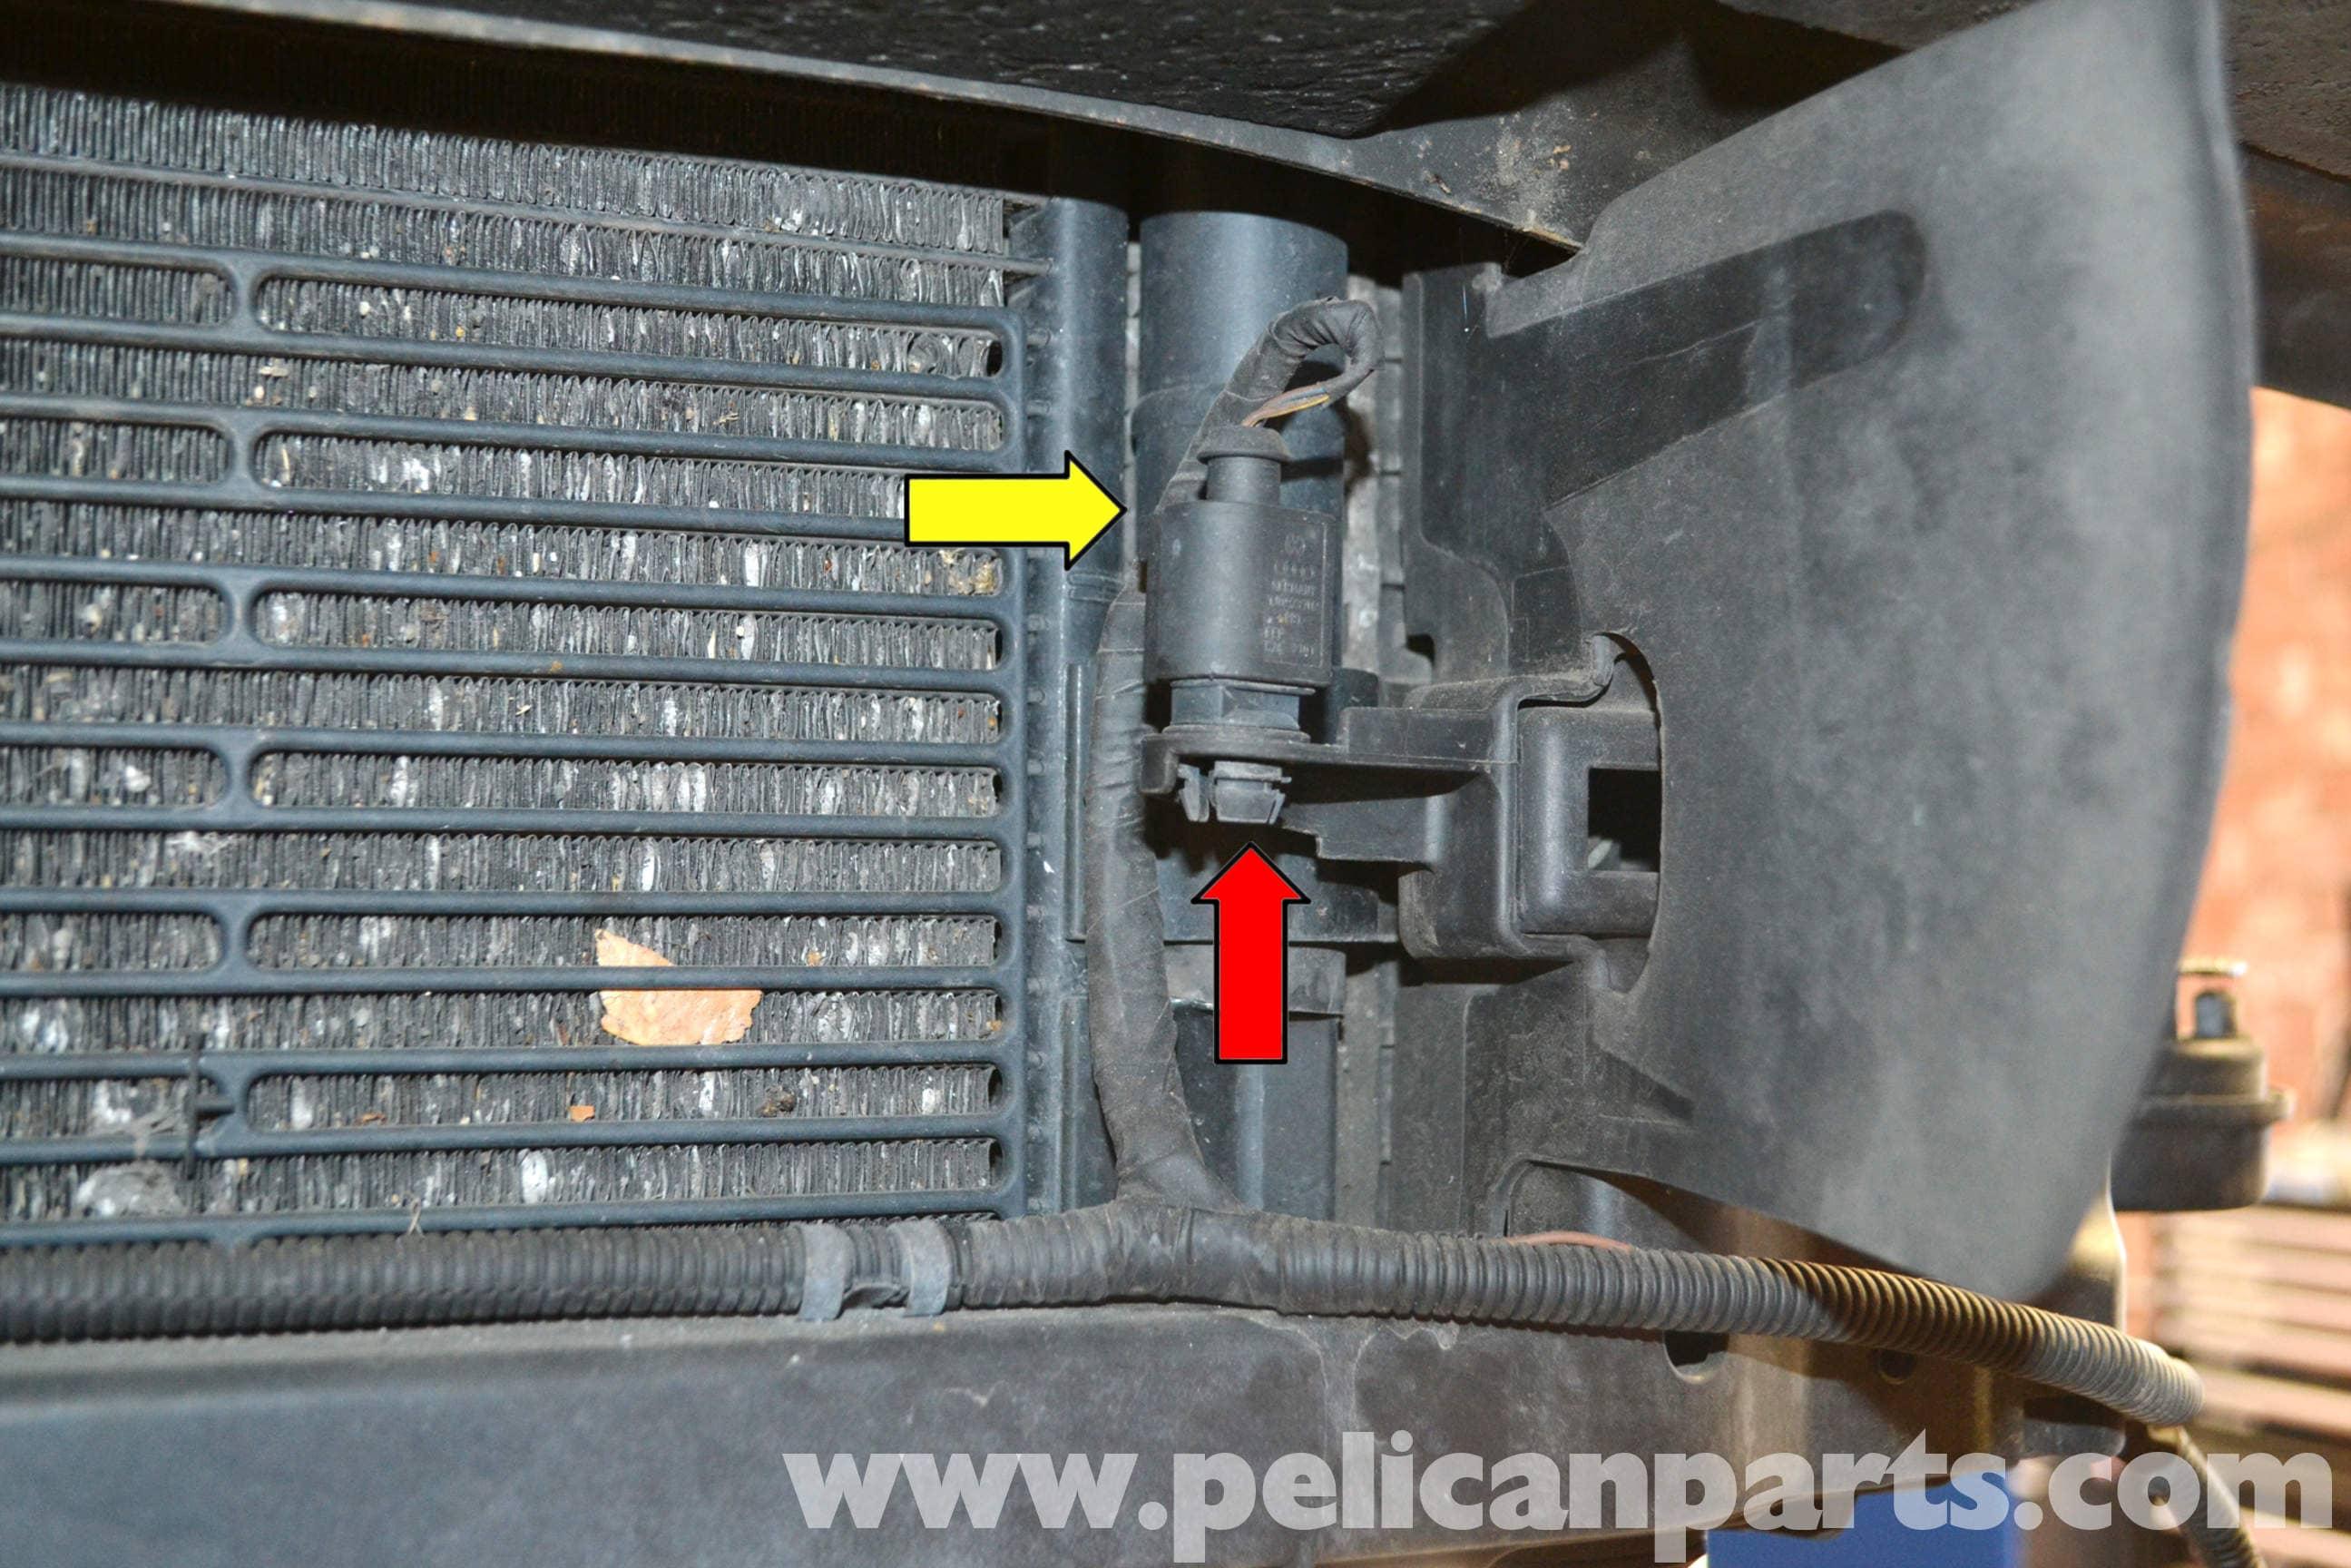 vw 1999 golf headlight wiring harness volkswagen    golf    gti mk v outside air temperature sensor  volkswagen    golf    gti mk v outside air temperature sensor